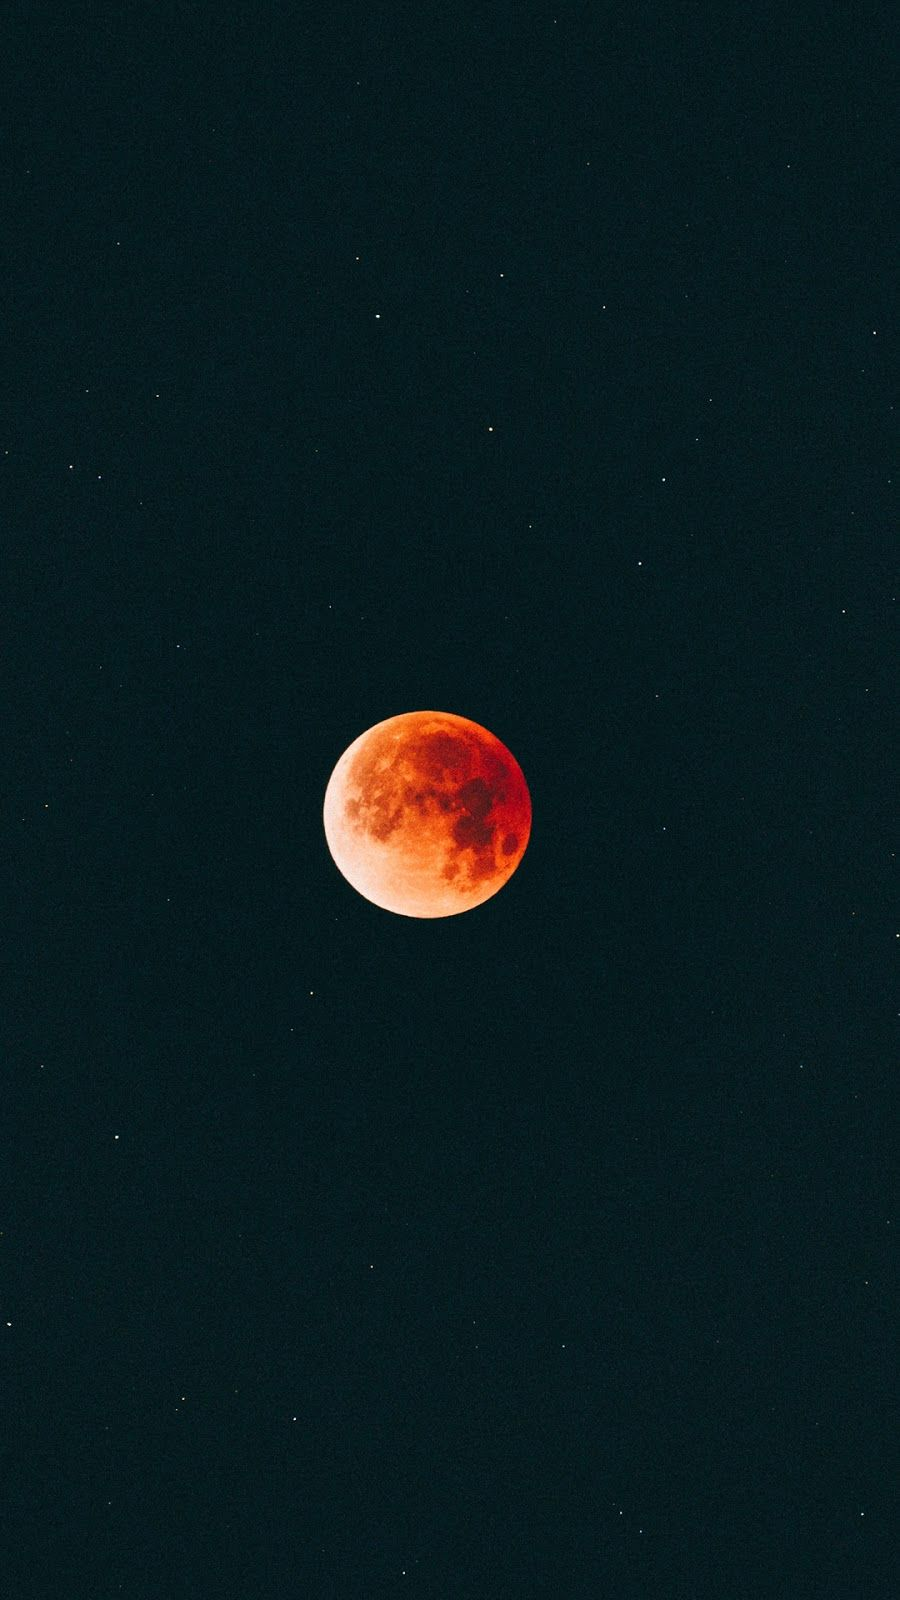 Blood Moon Notti Di Luna Sfondi Per Iphone Sfondi Carini E